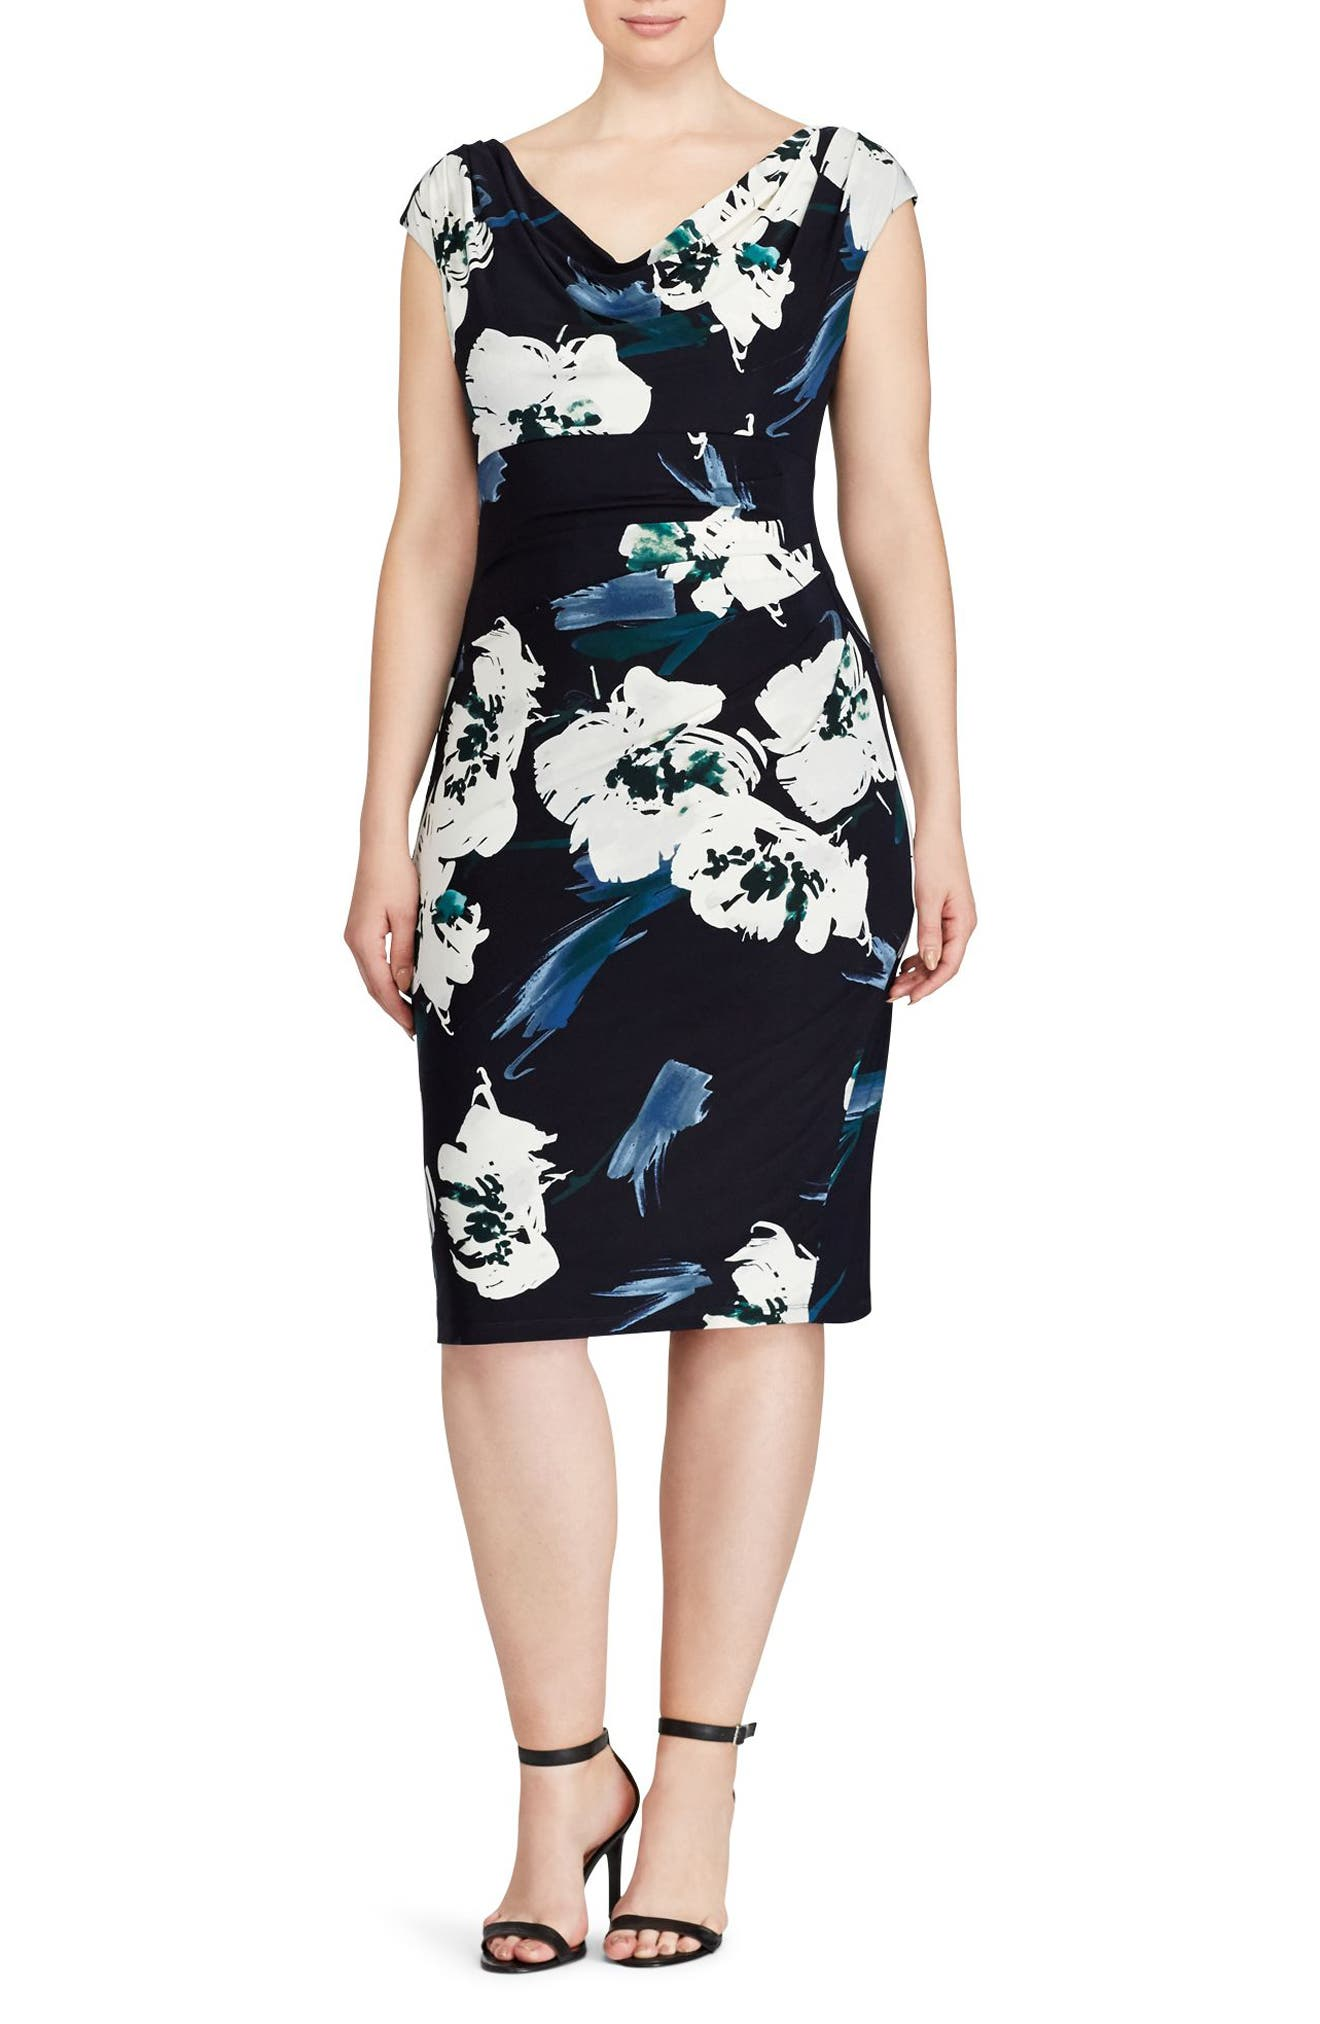 Alternate Image 1 Selected - Lauren Ralph Lauren Floral Sheath Dress (Plus Size)